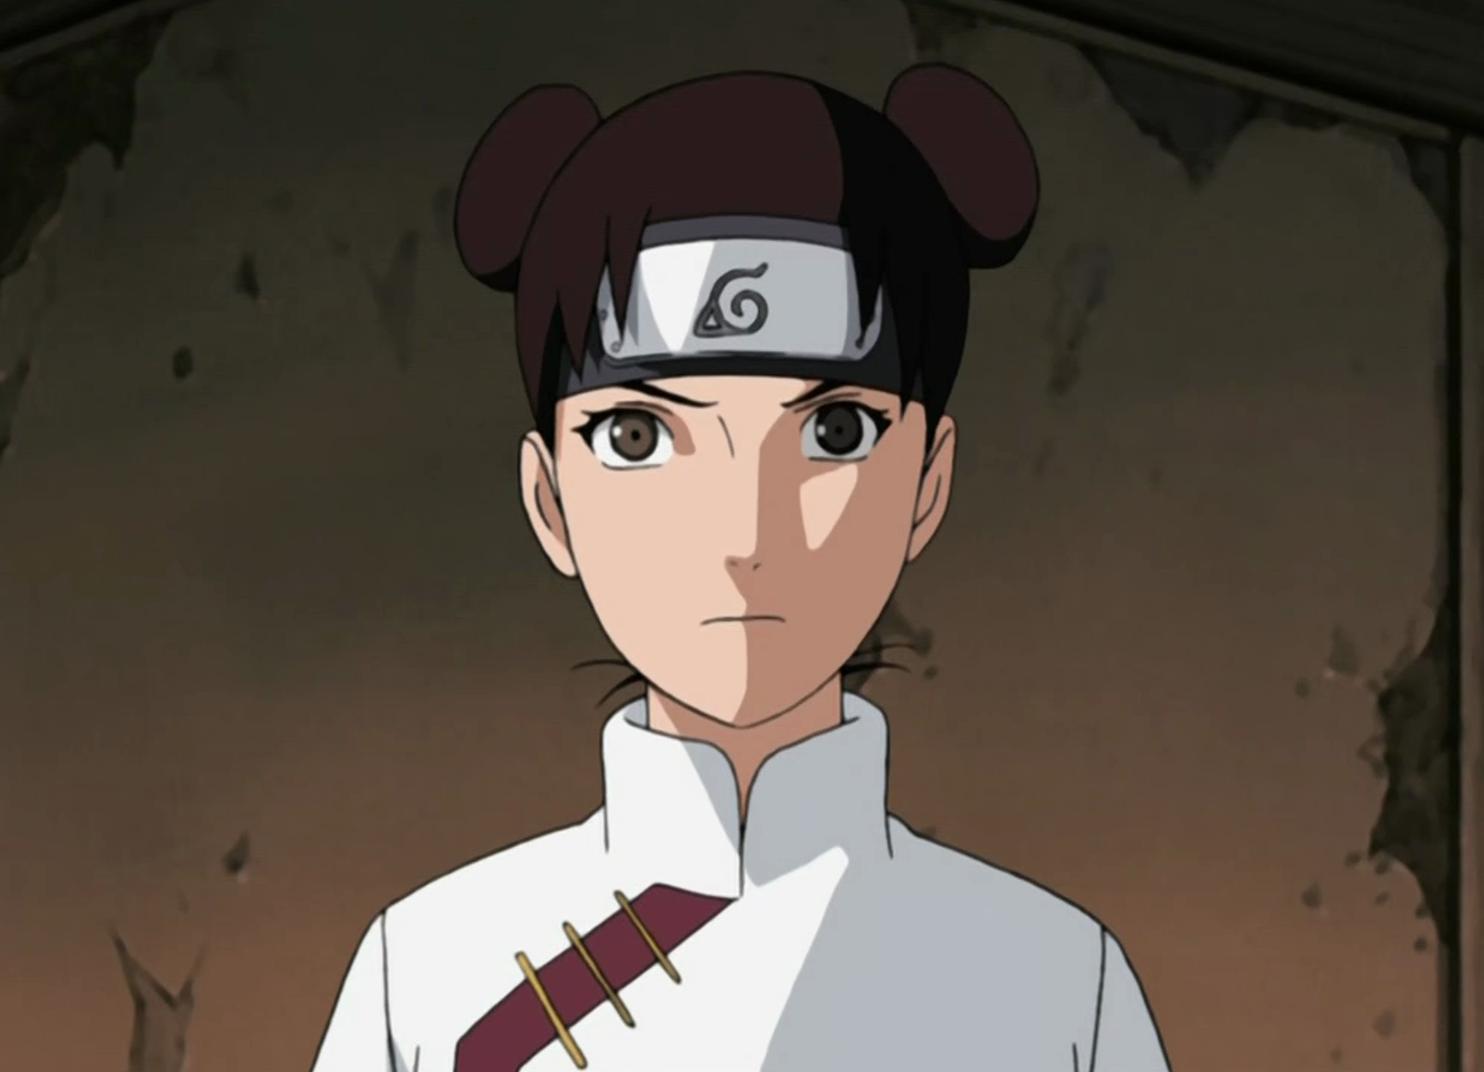 Tenten Naruto Bleach Fairy Tail Fullmetal Alchemist Wikia Fandom